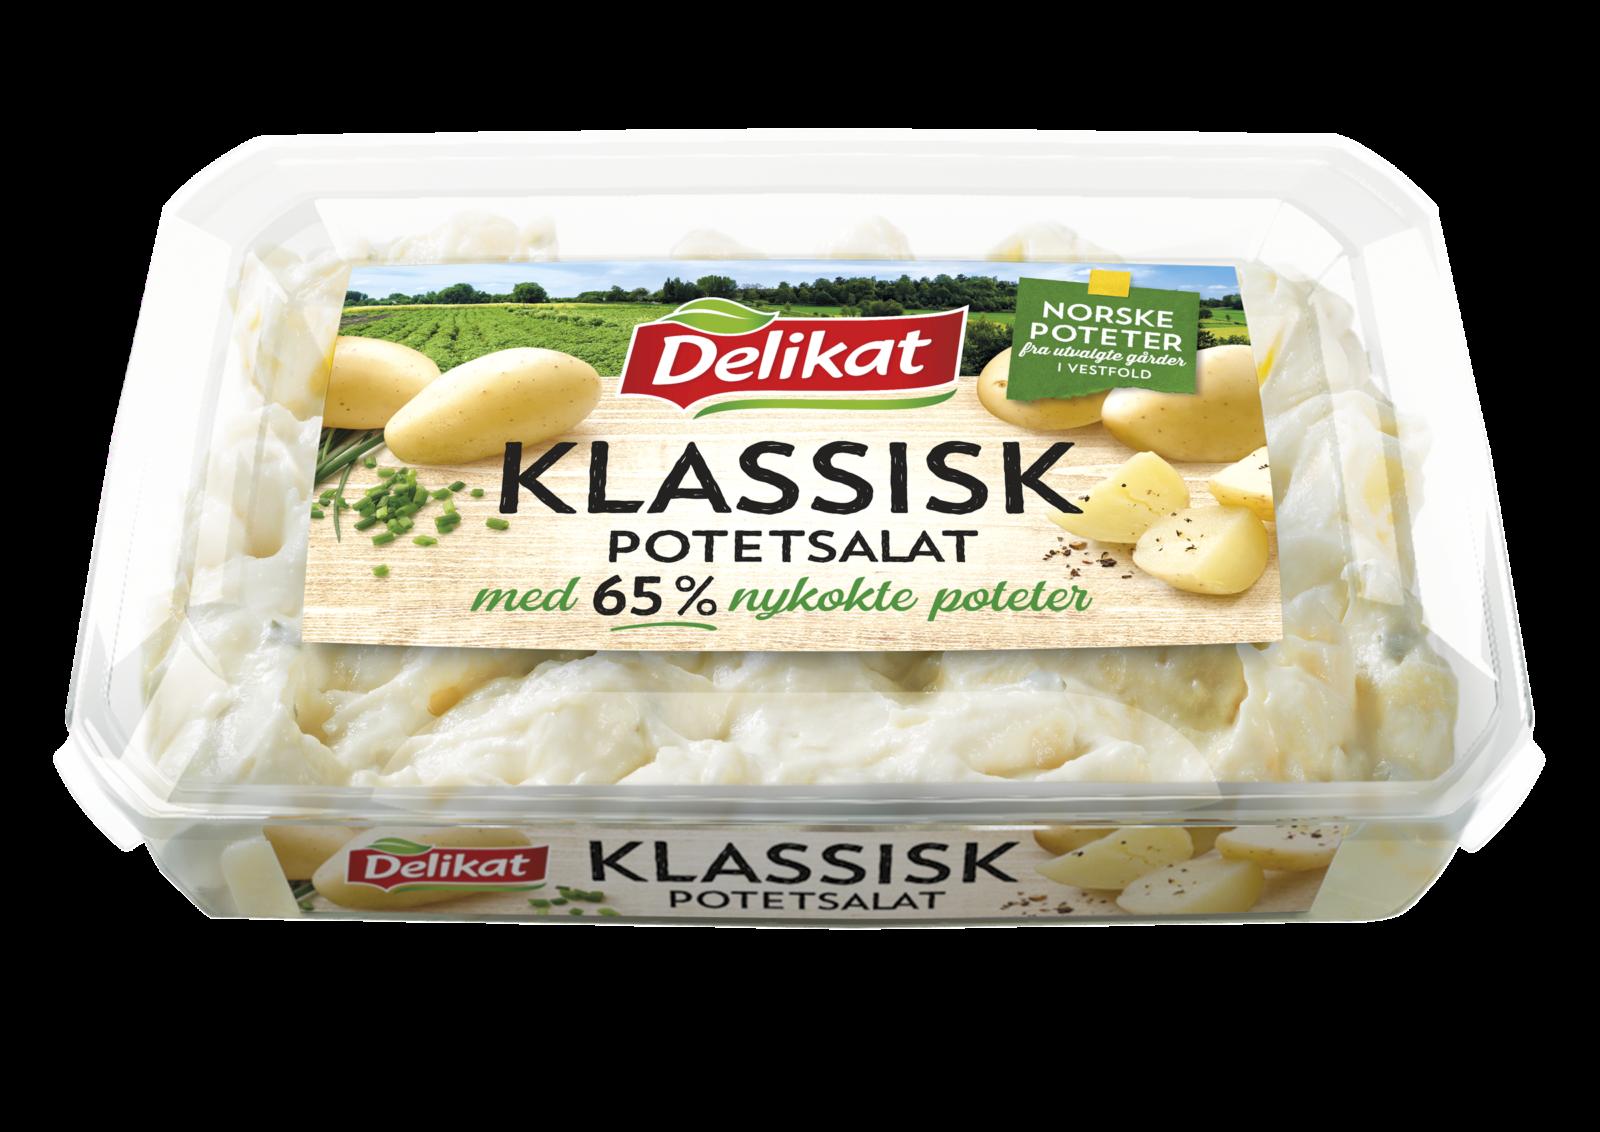 Delikat Klassisk Potetsalat